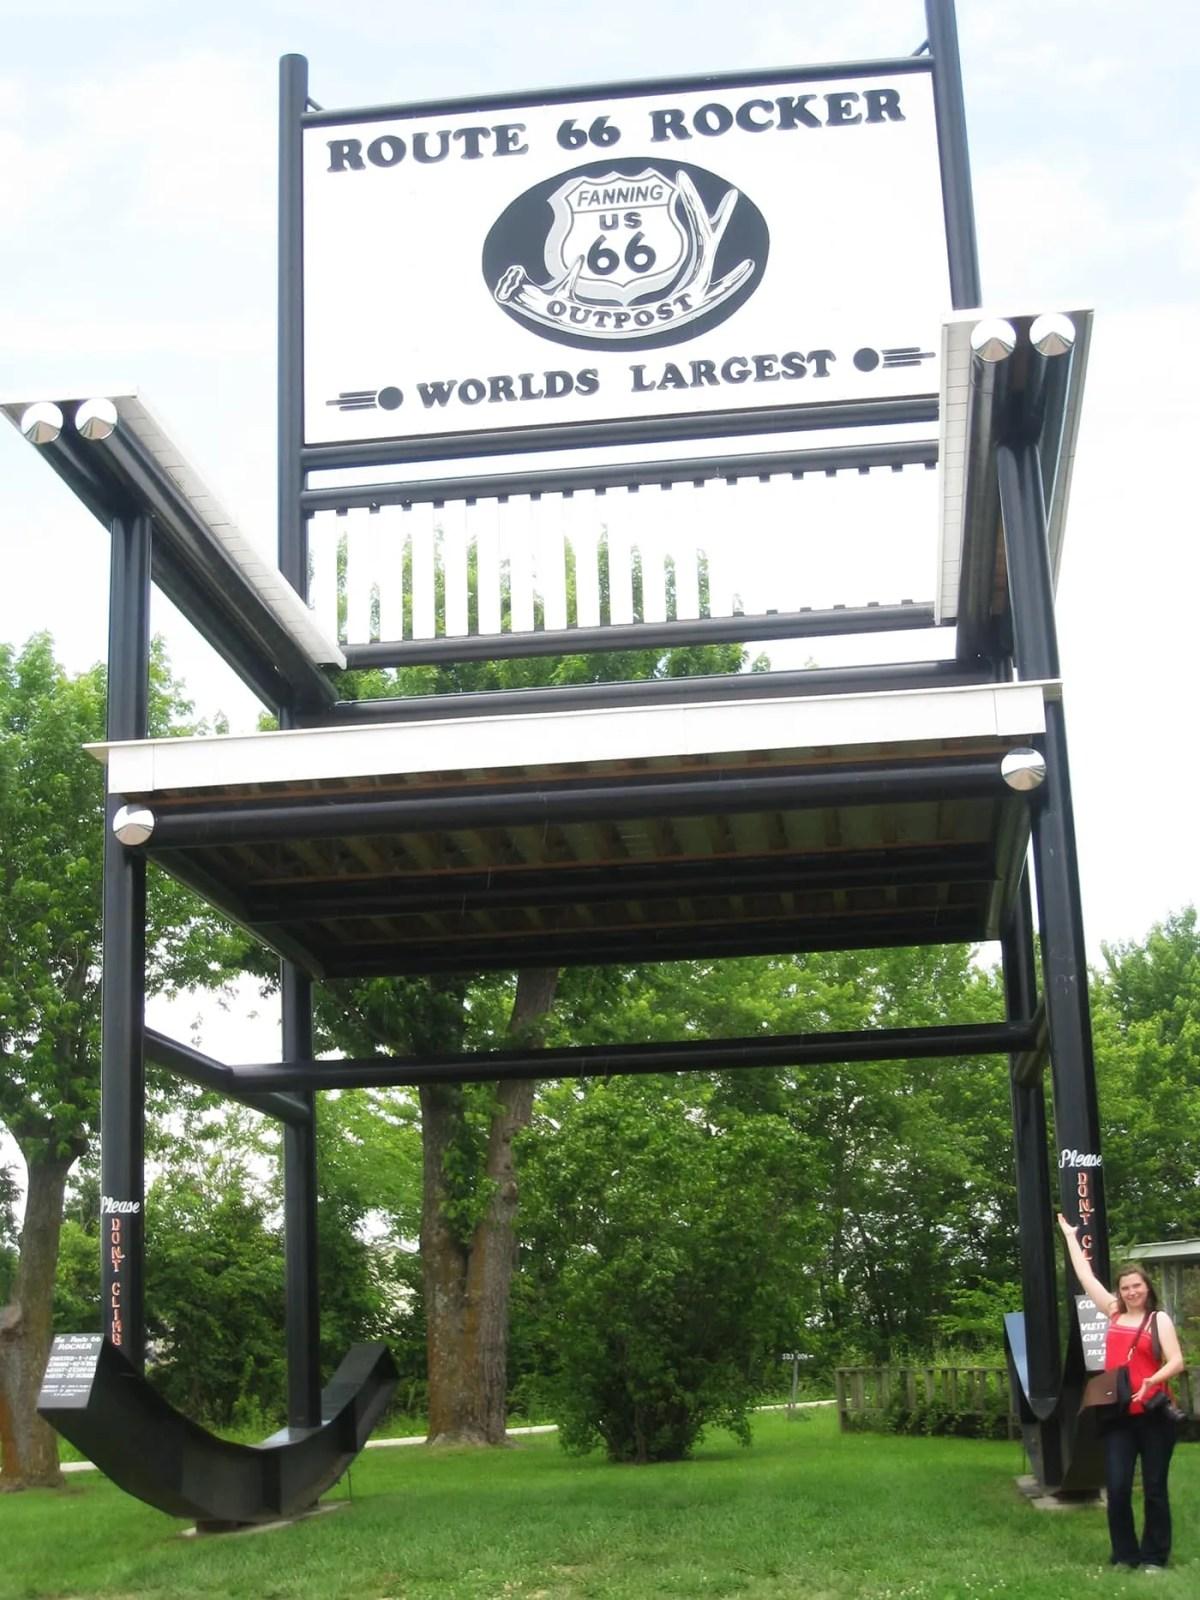 World's Largest Rocking Chair in Cuba, Missouri